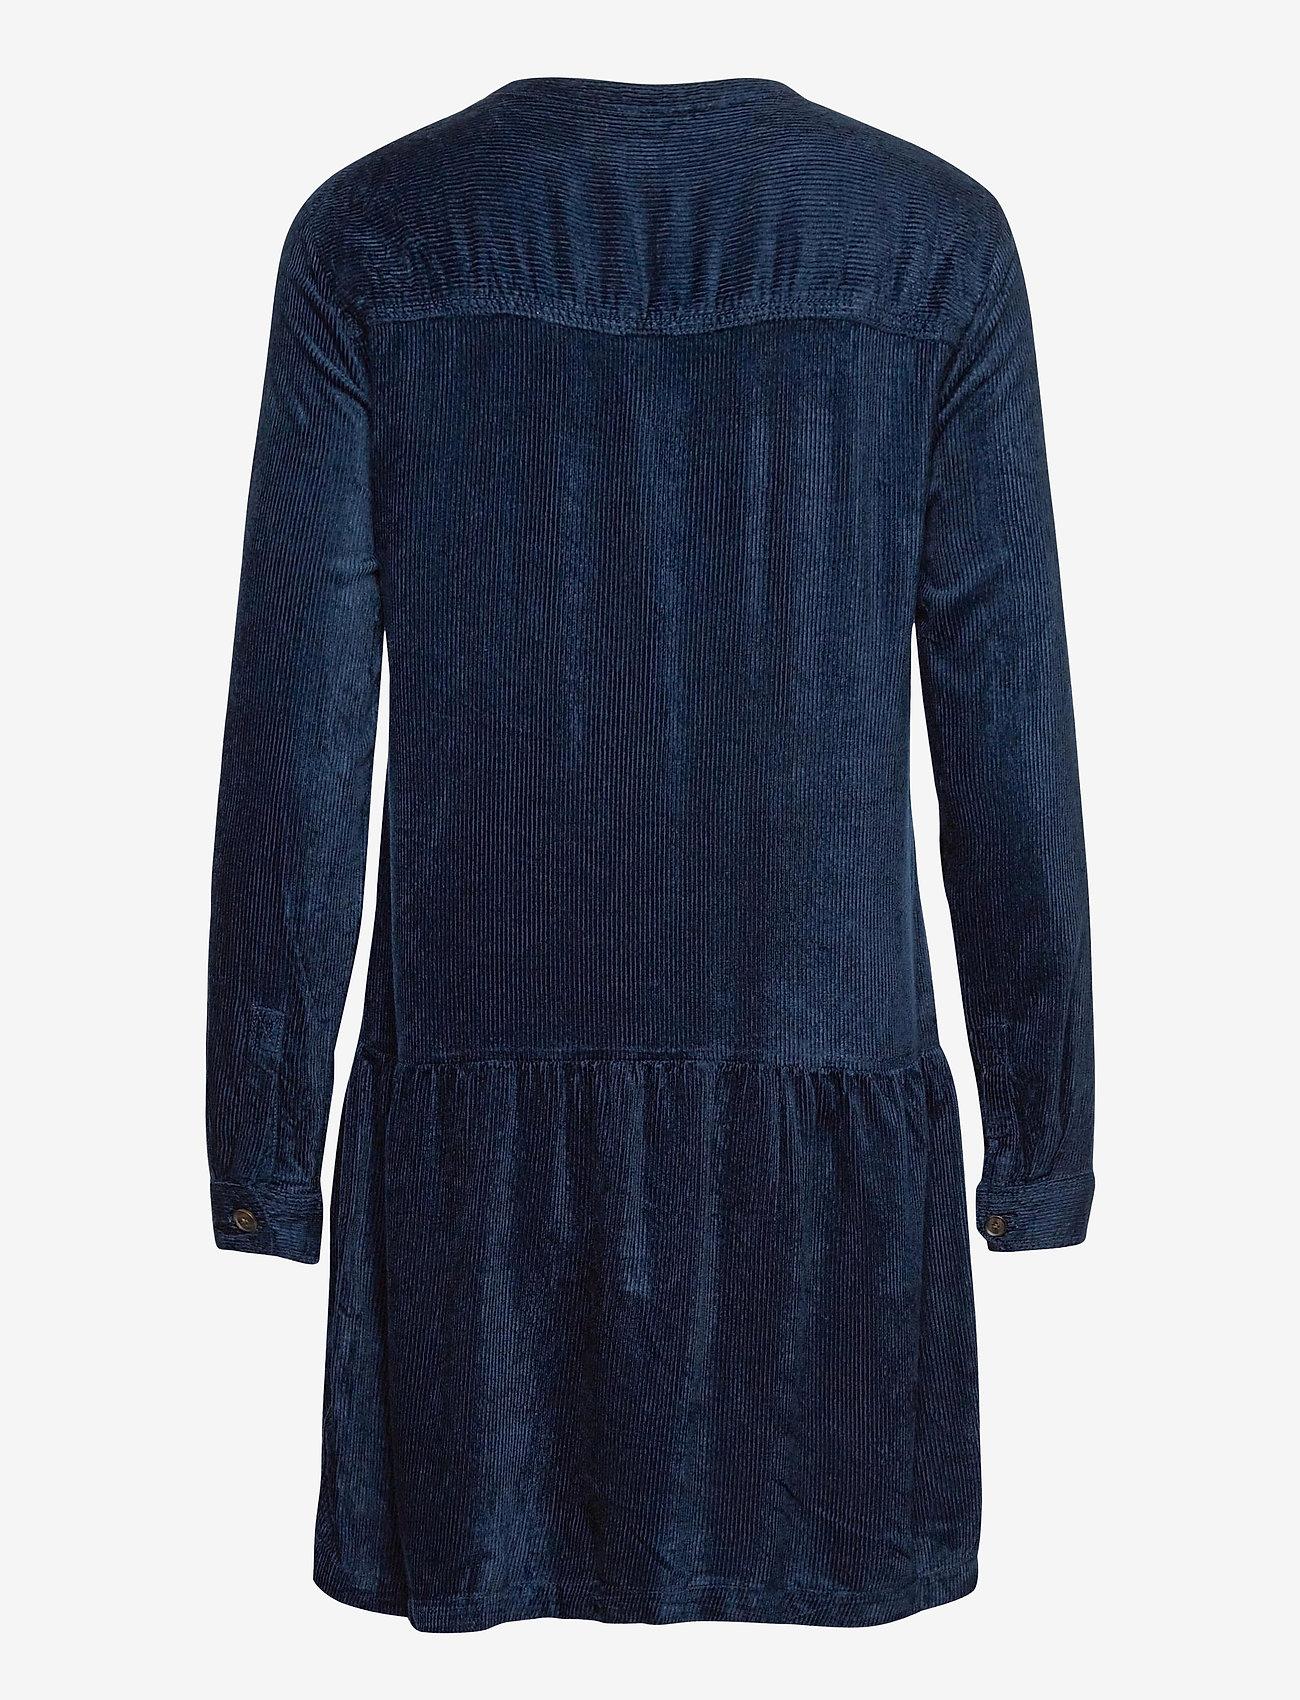 GAP - Corduroy Shirtdress - alledaagse jurken - night - 1